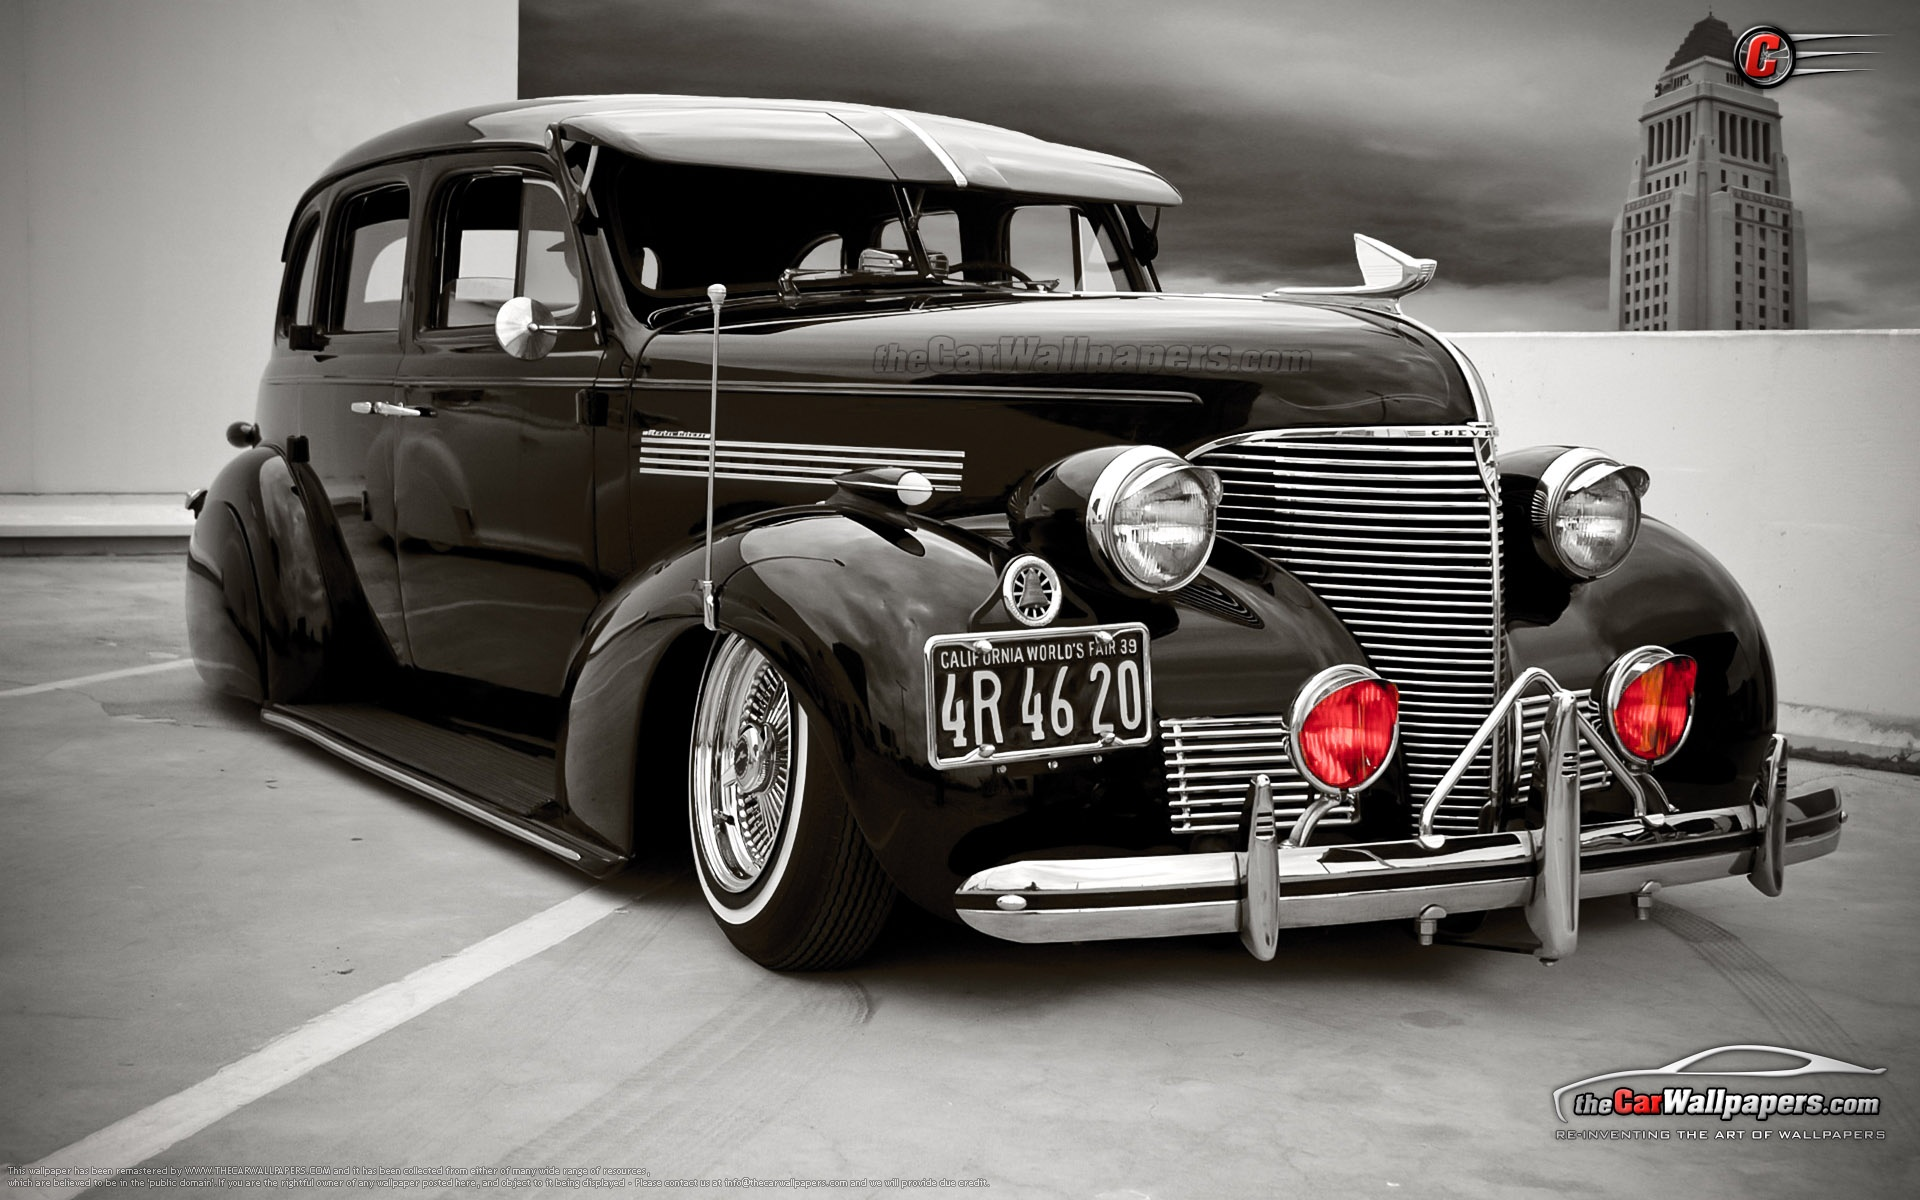 Retro rat rods hot classic custom tuning wallpaper 1920x1200 34390 1920x1200